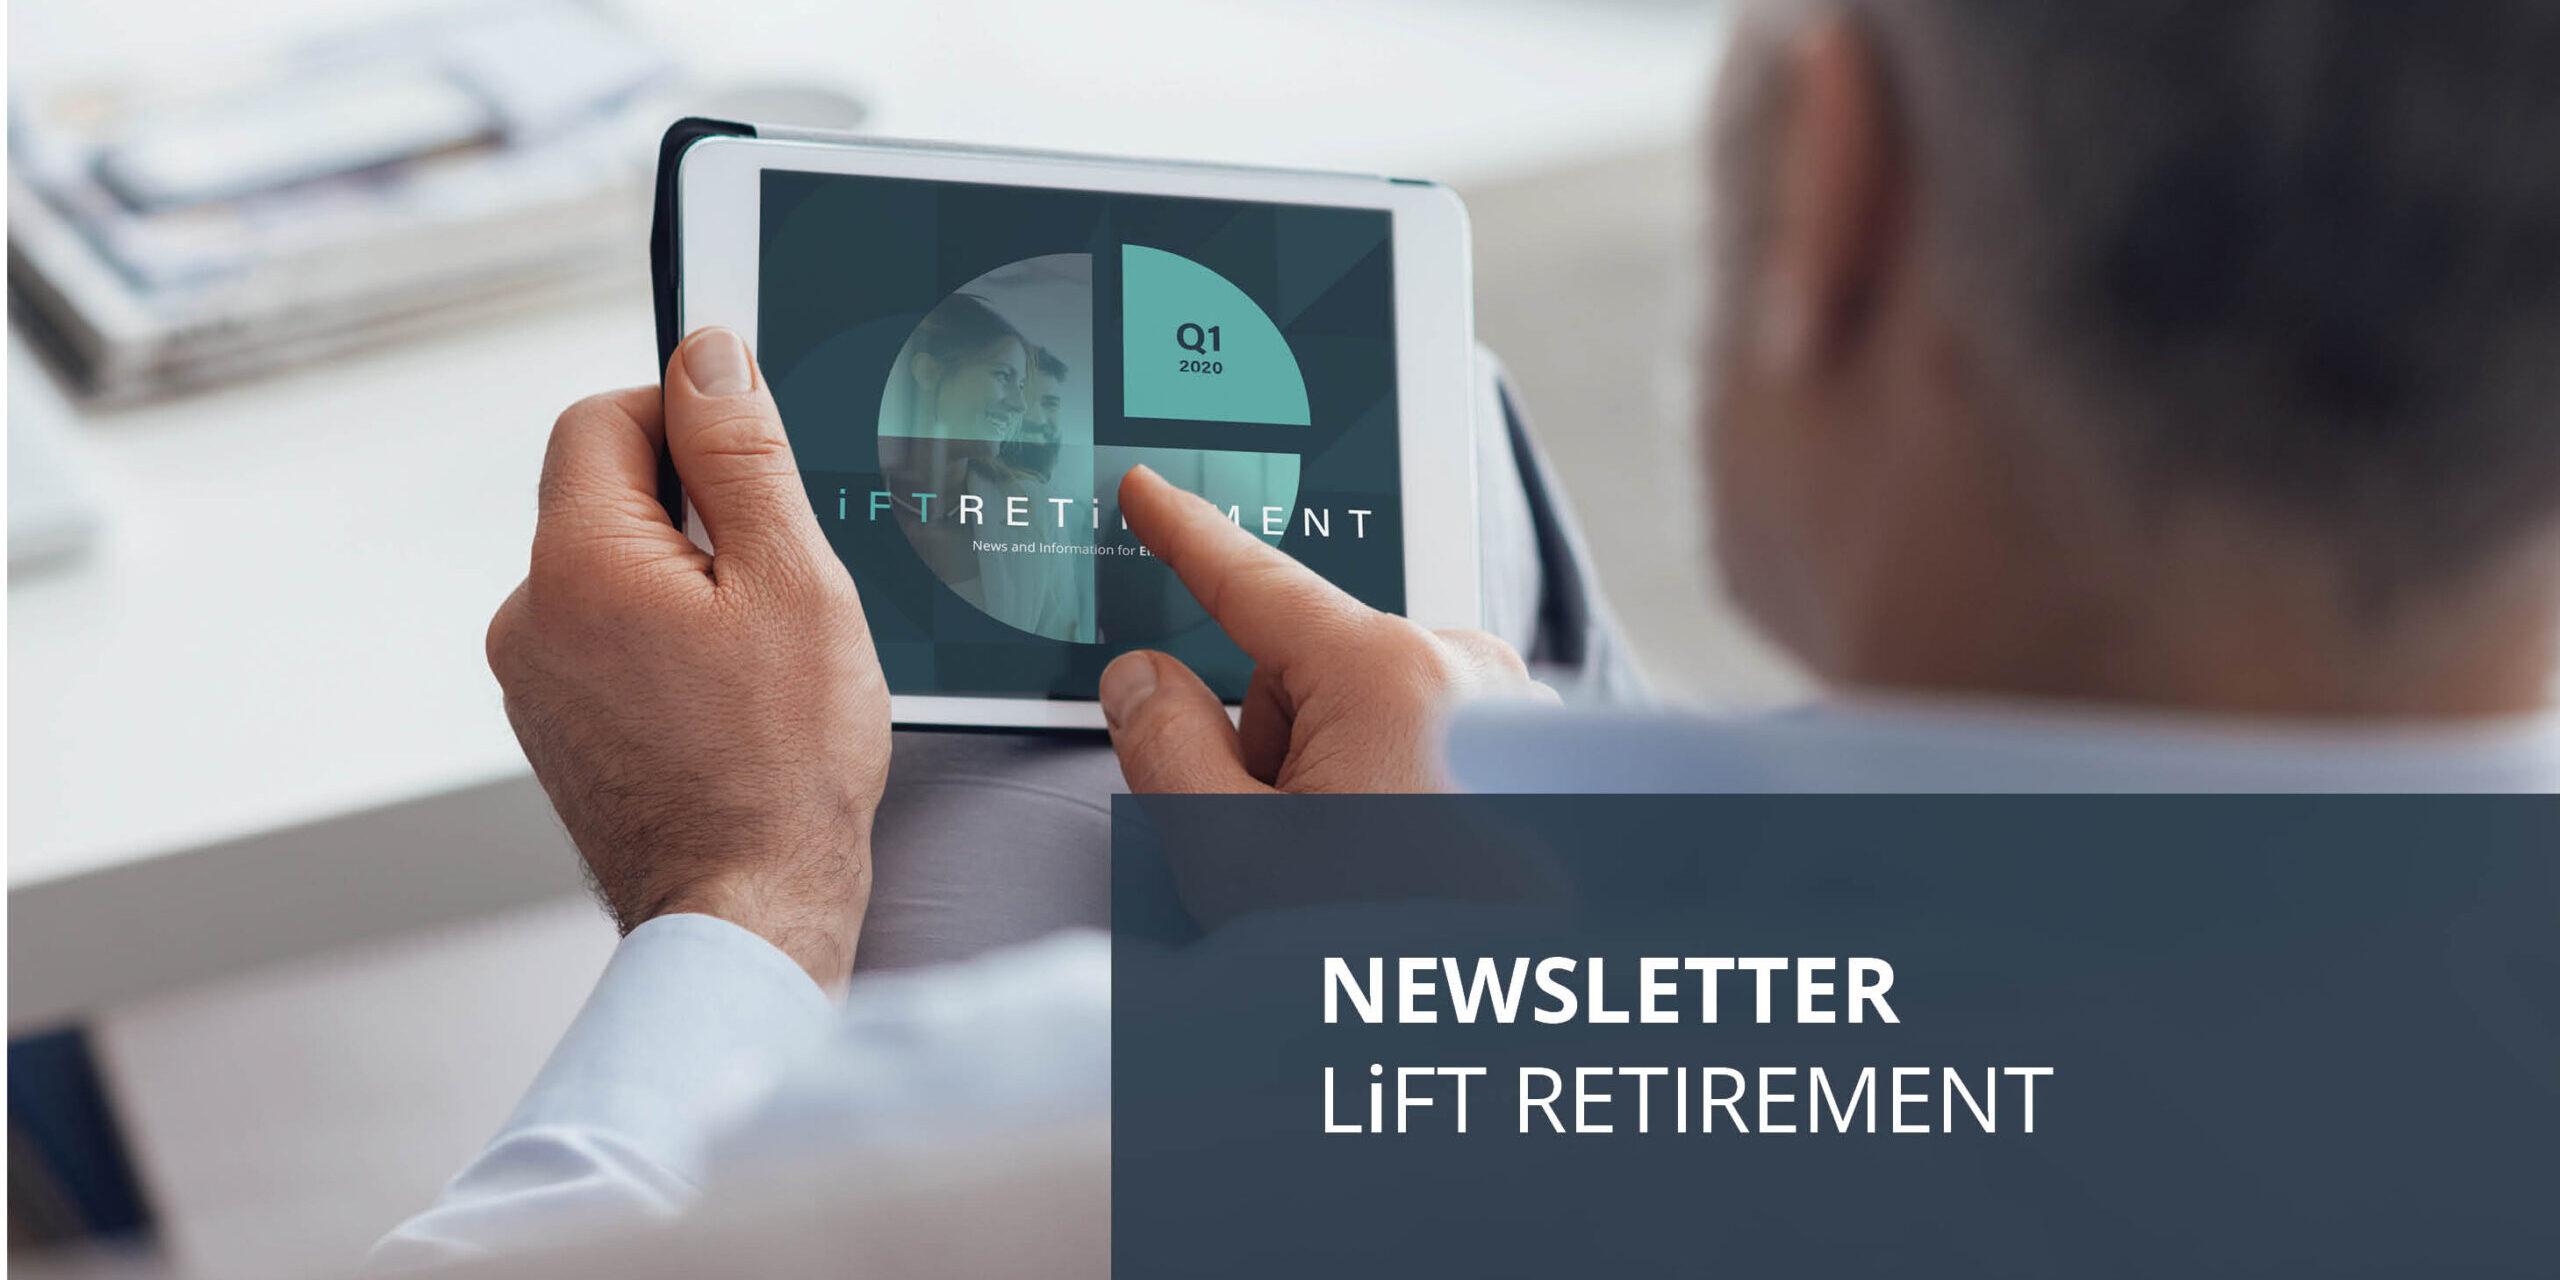 Headline Image - Q1 2020 Lift Retirement